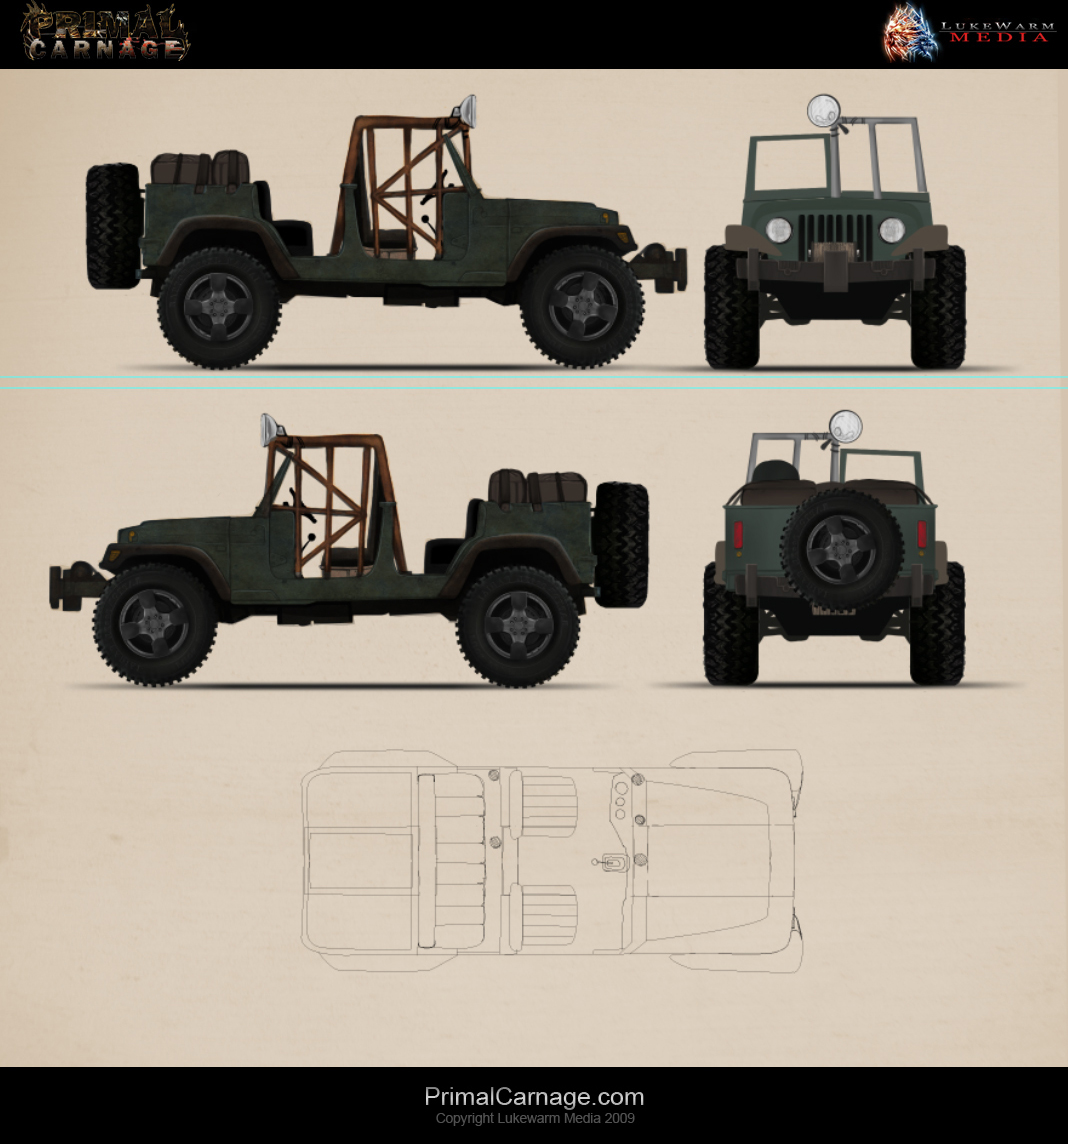 Primal Carnage Concept Art Image Indie Db